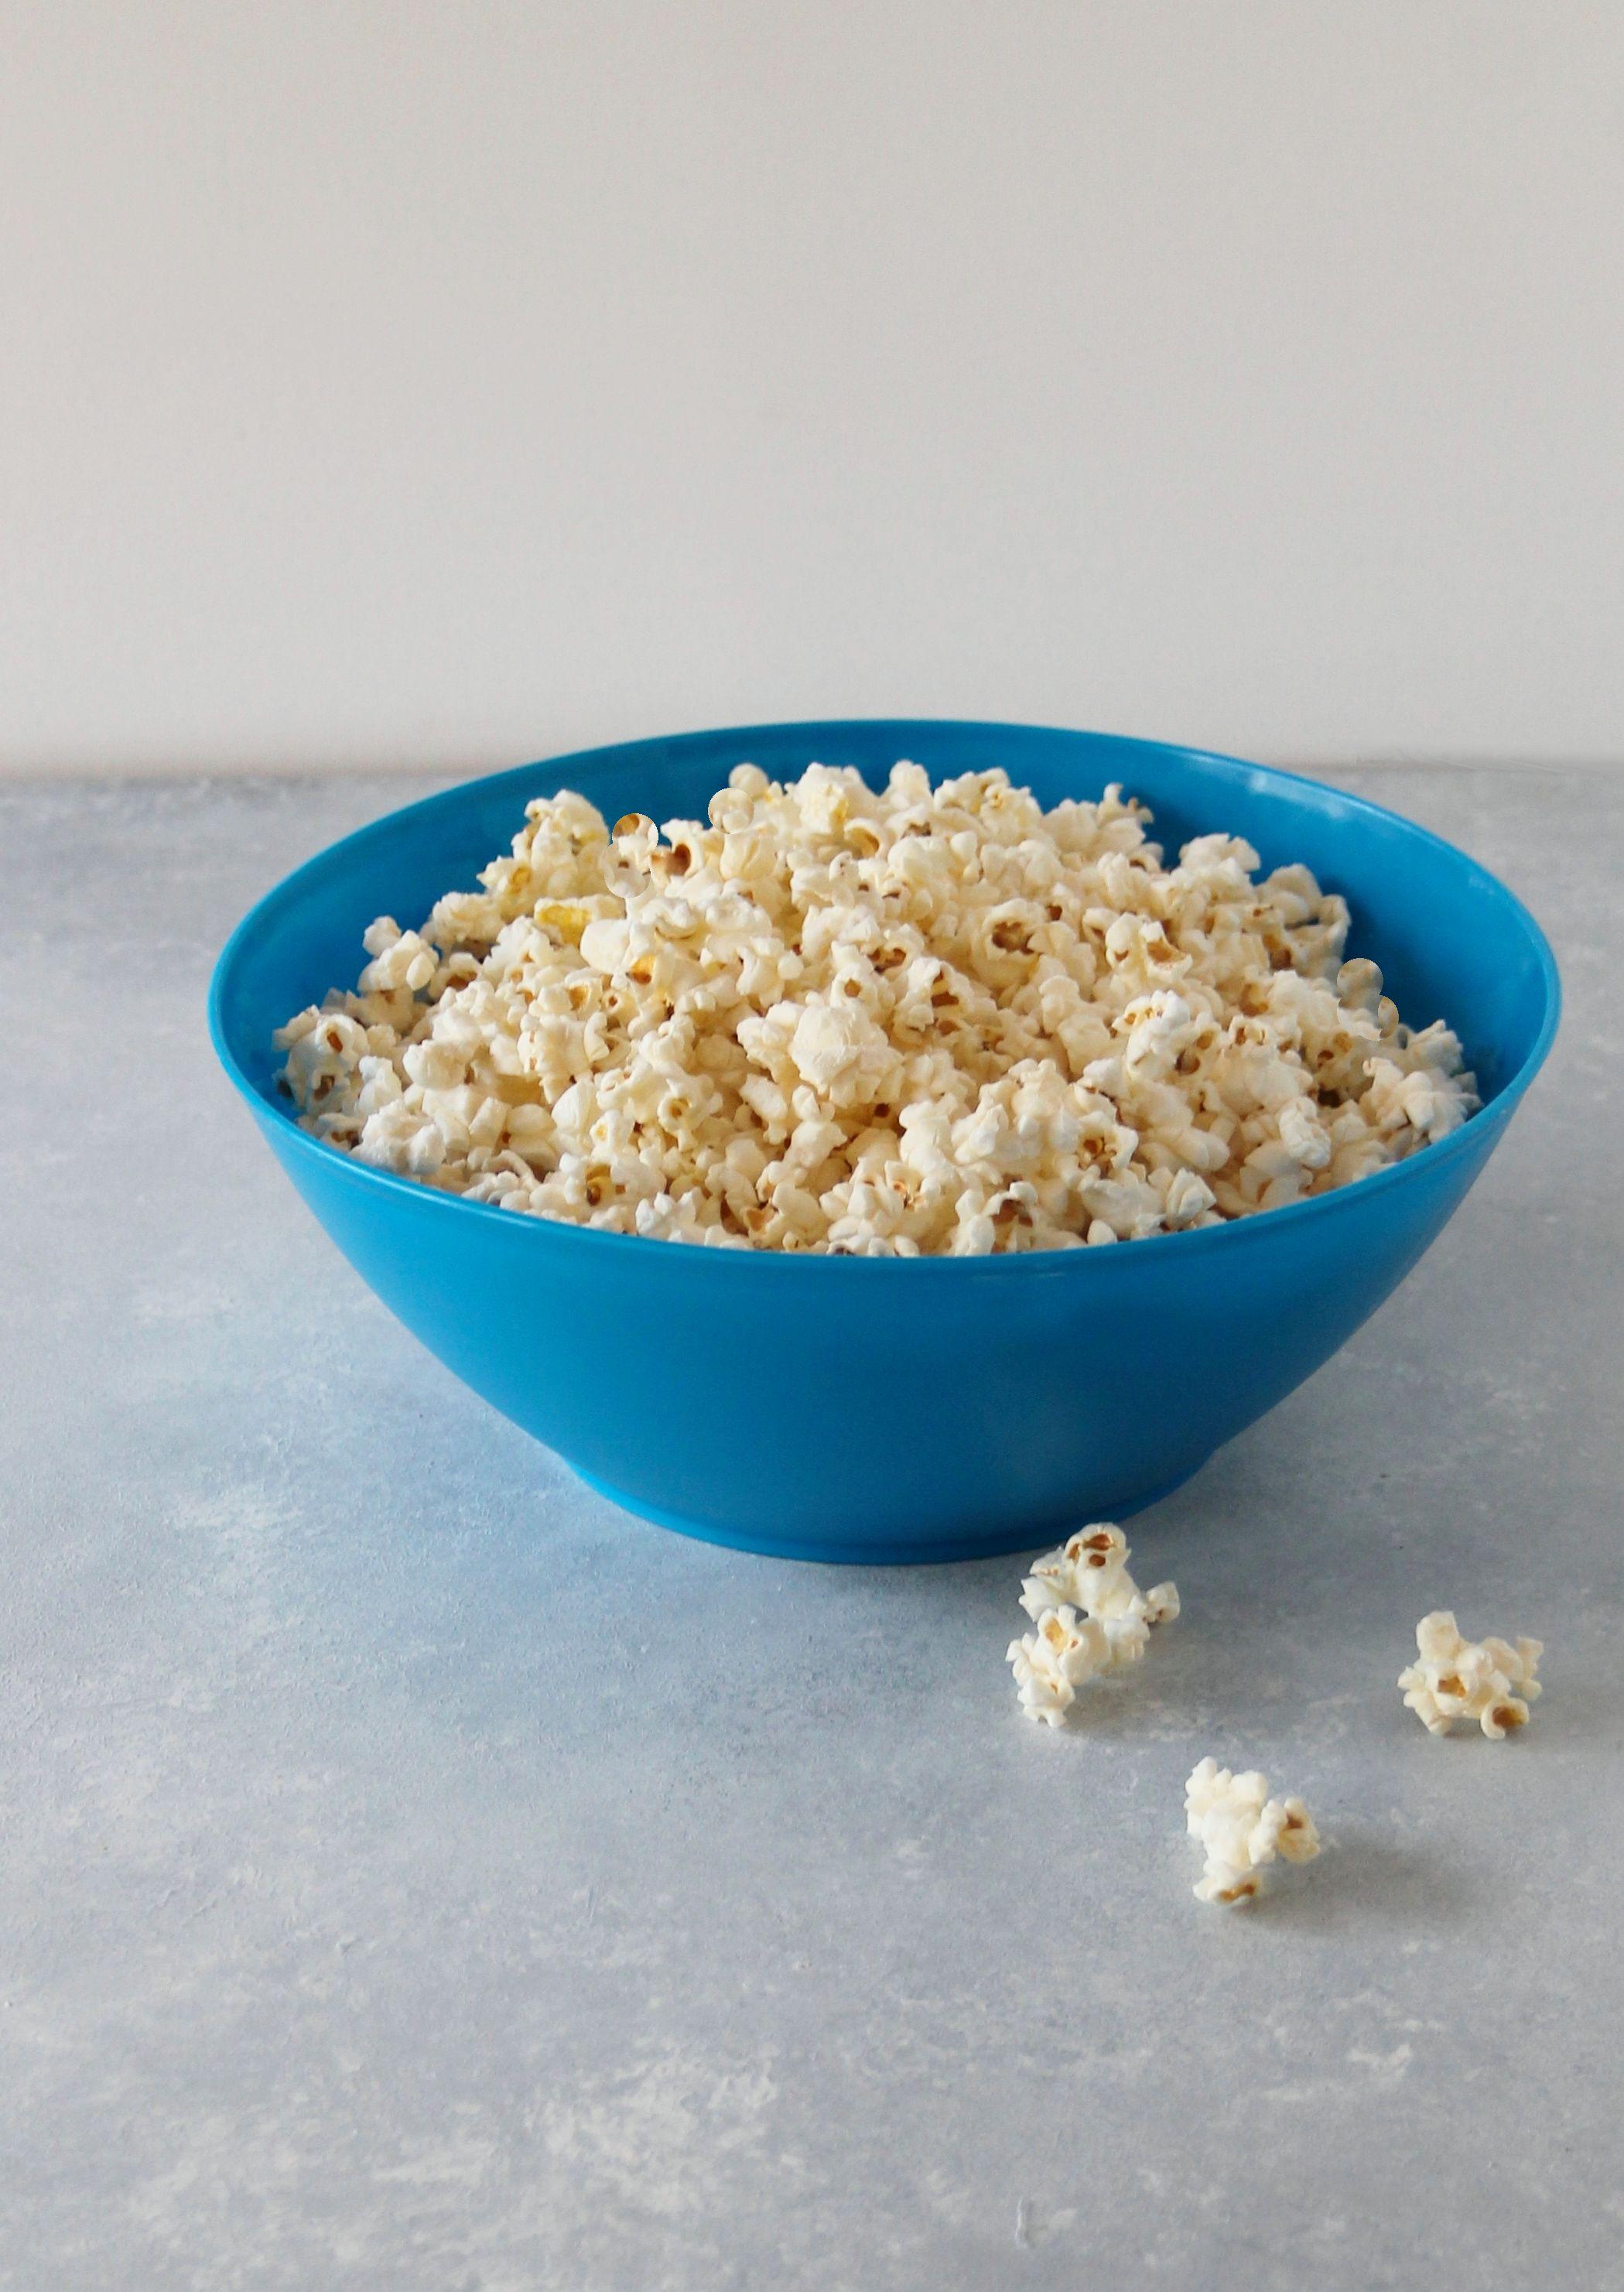 Beyond Stovetop: My Fave Alternative to Microwave Popcorn